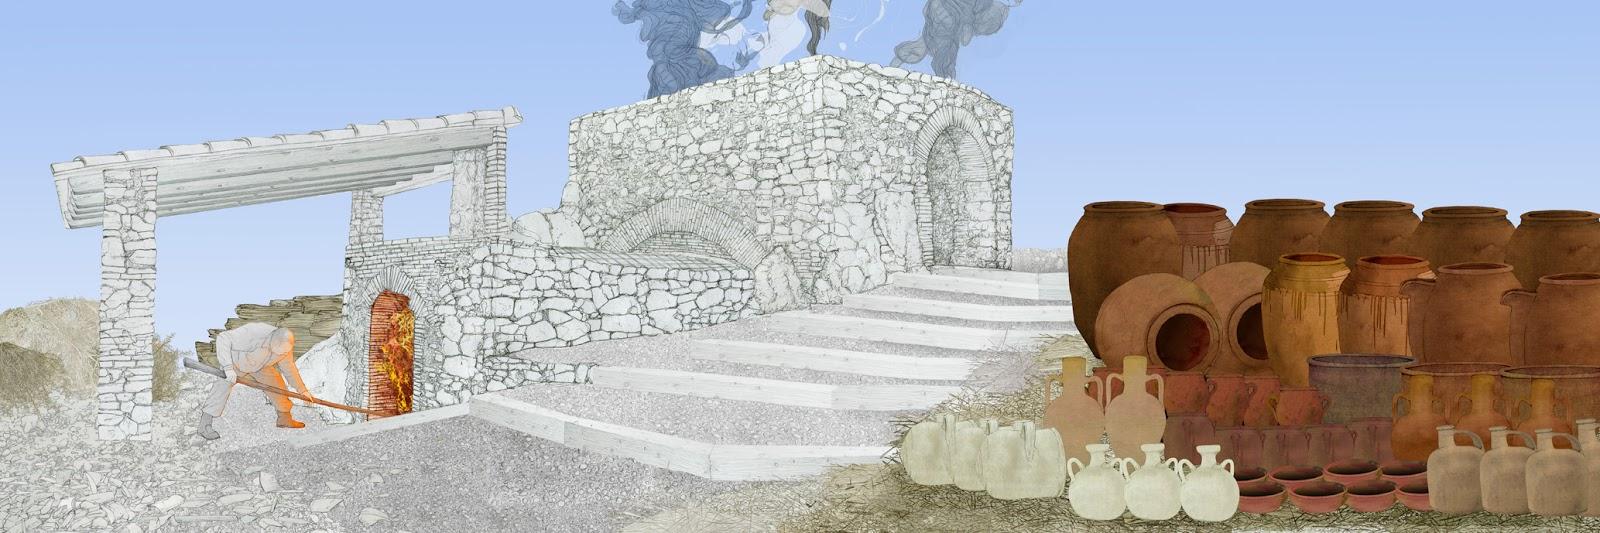 Castello de Rugat, Ceramica de barro, horno